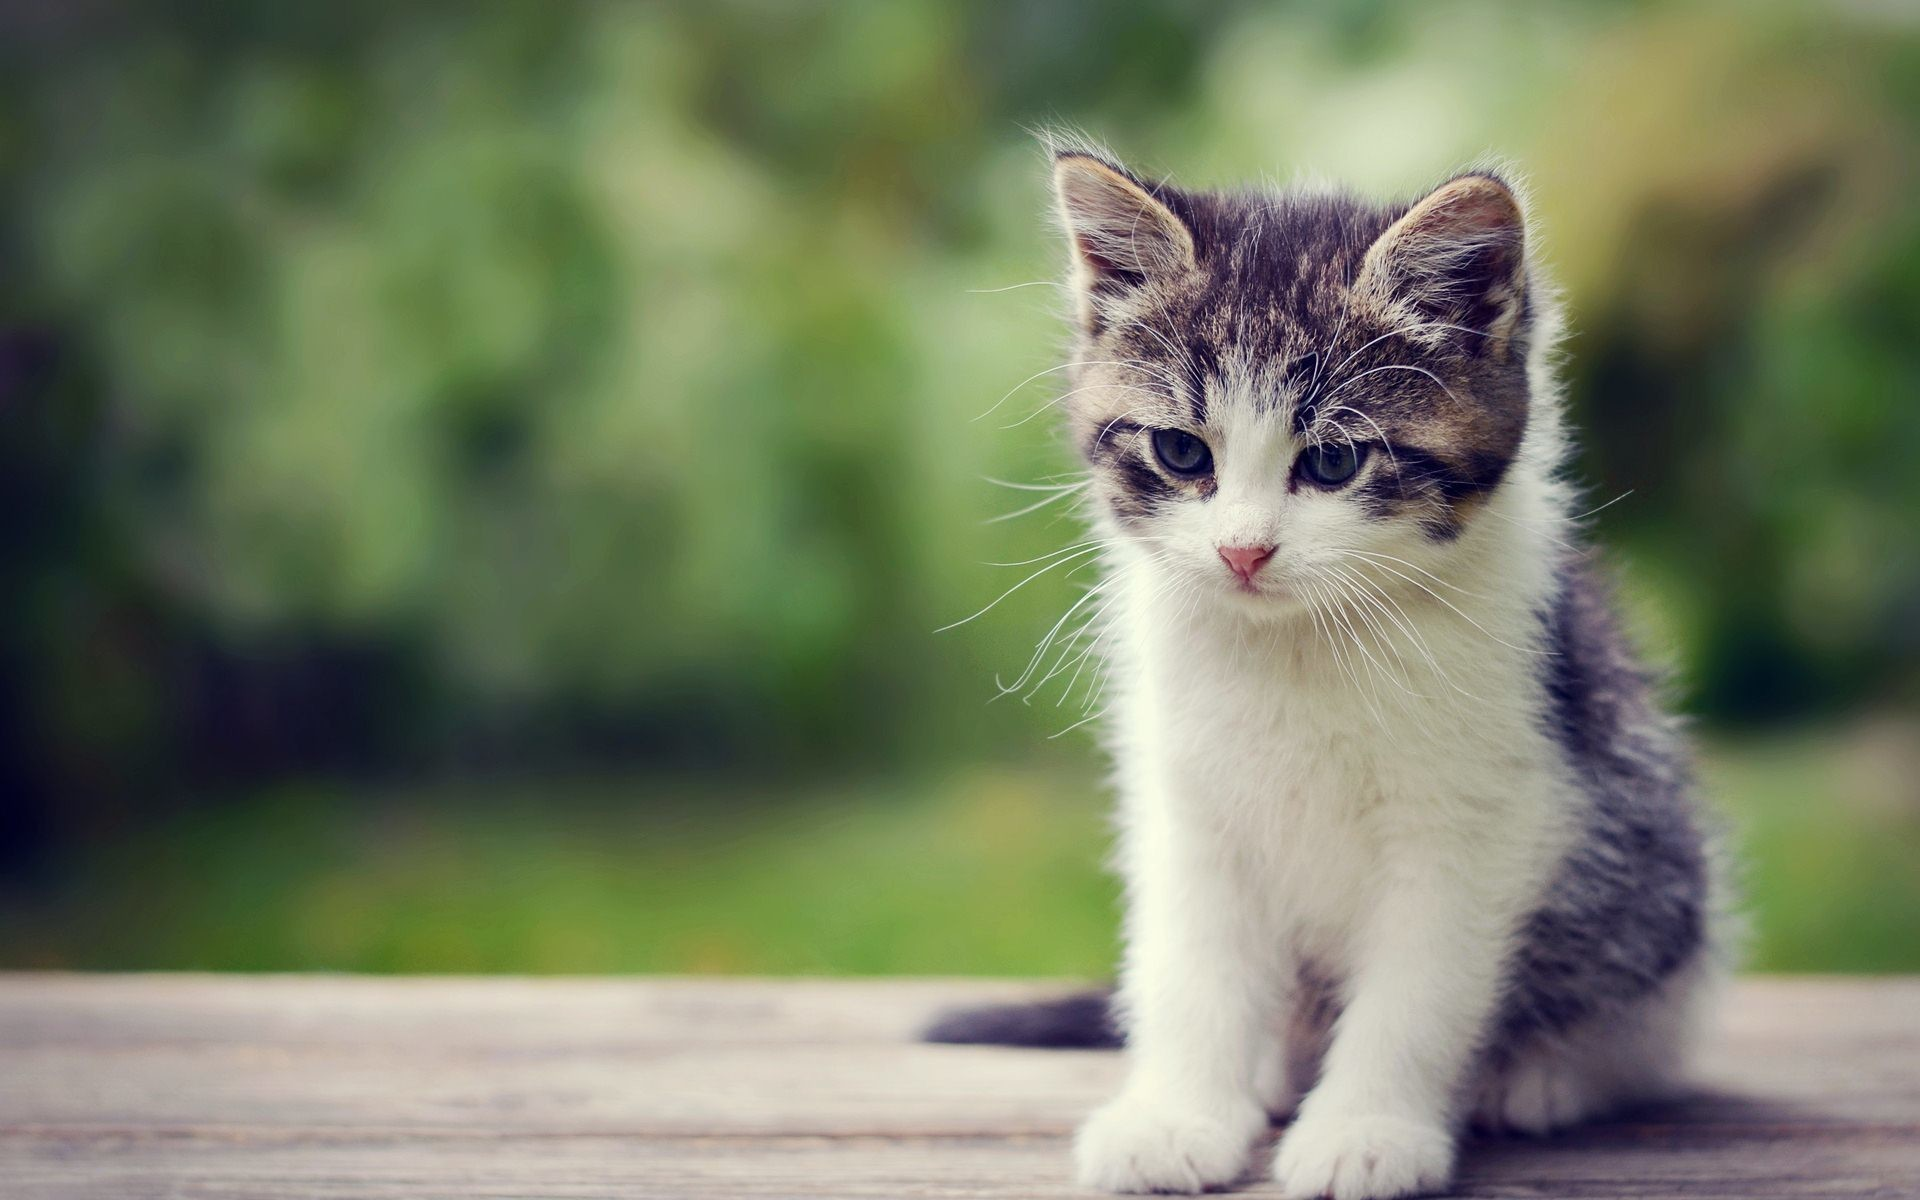 Cute kitten background 59 images 1920x1200 kitten wallpapers wide altavistaventures Image collections